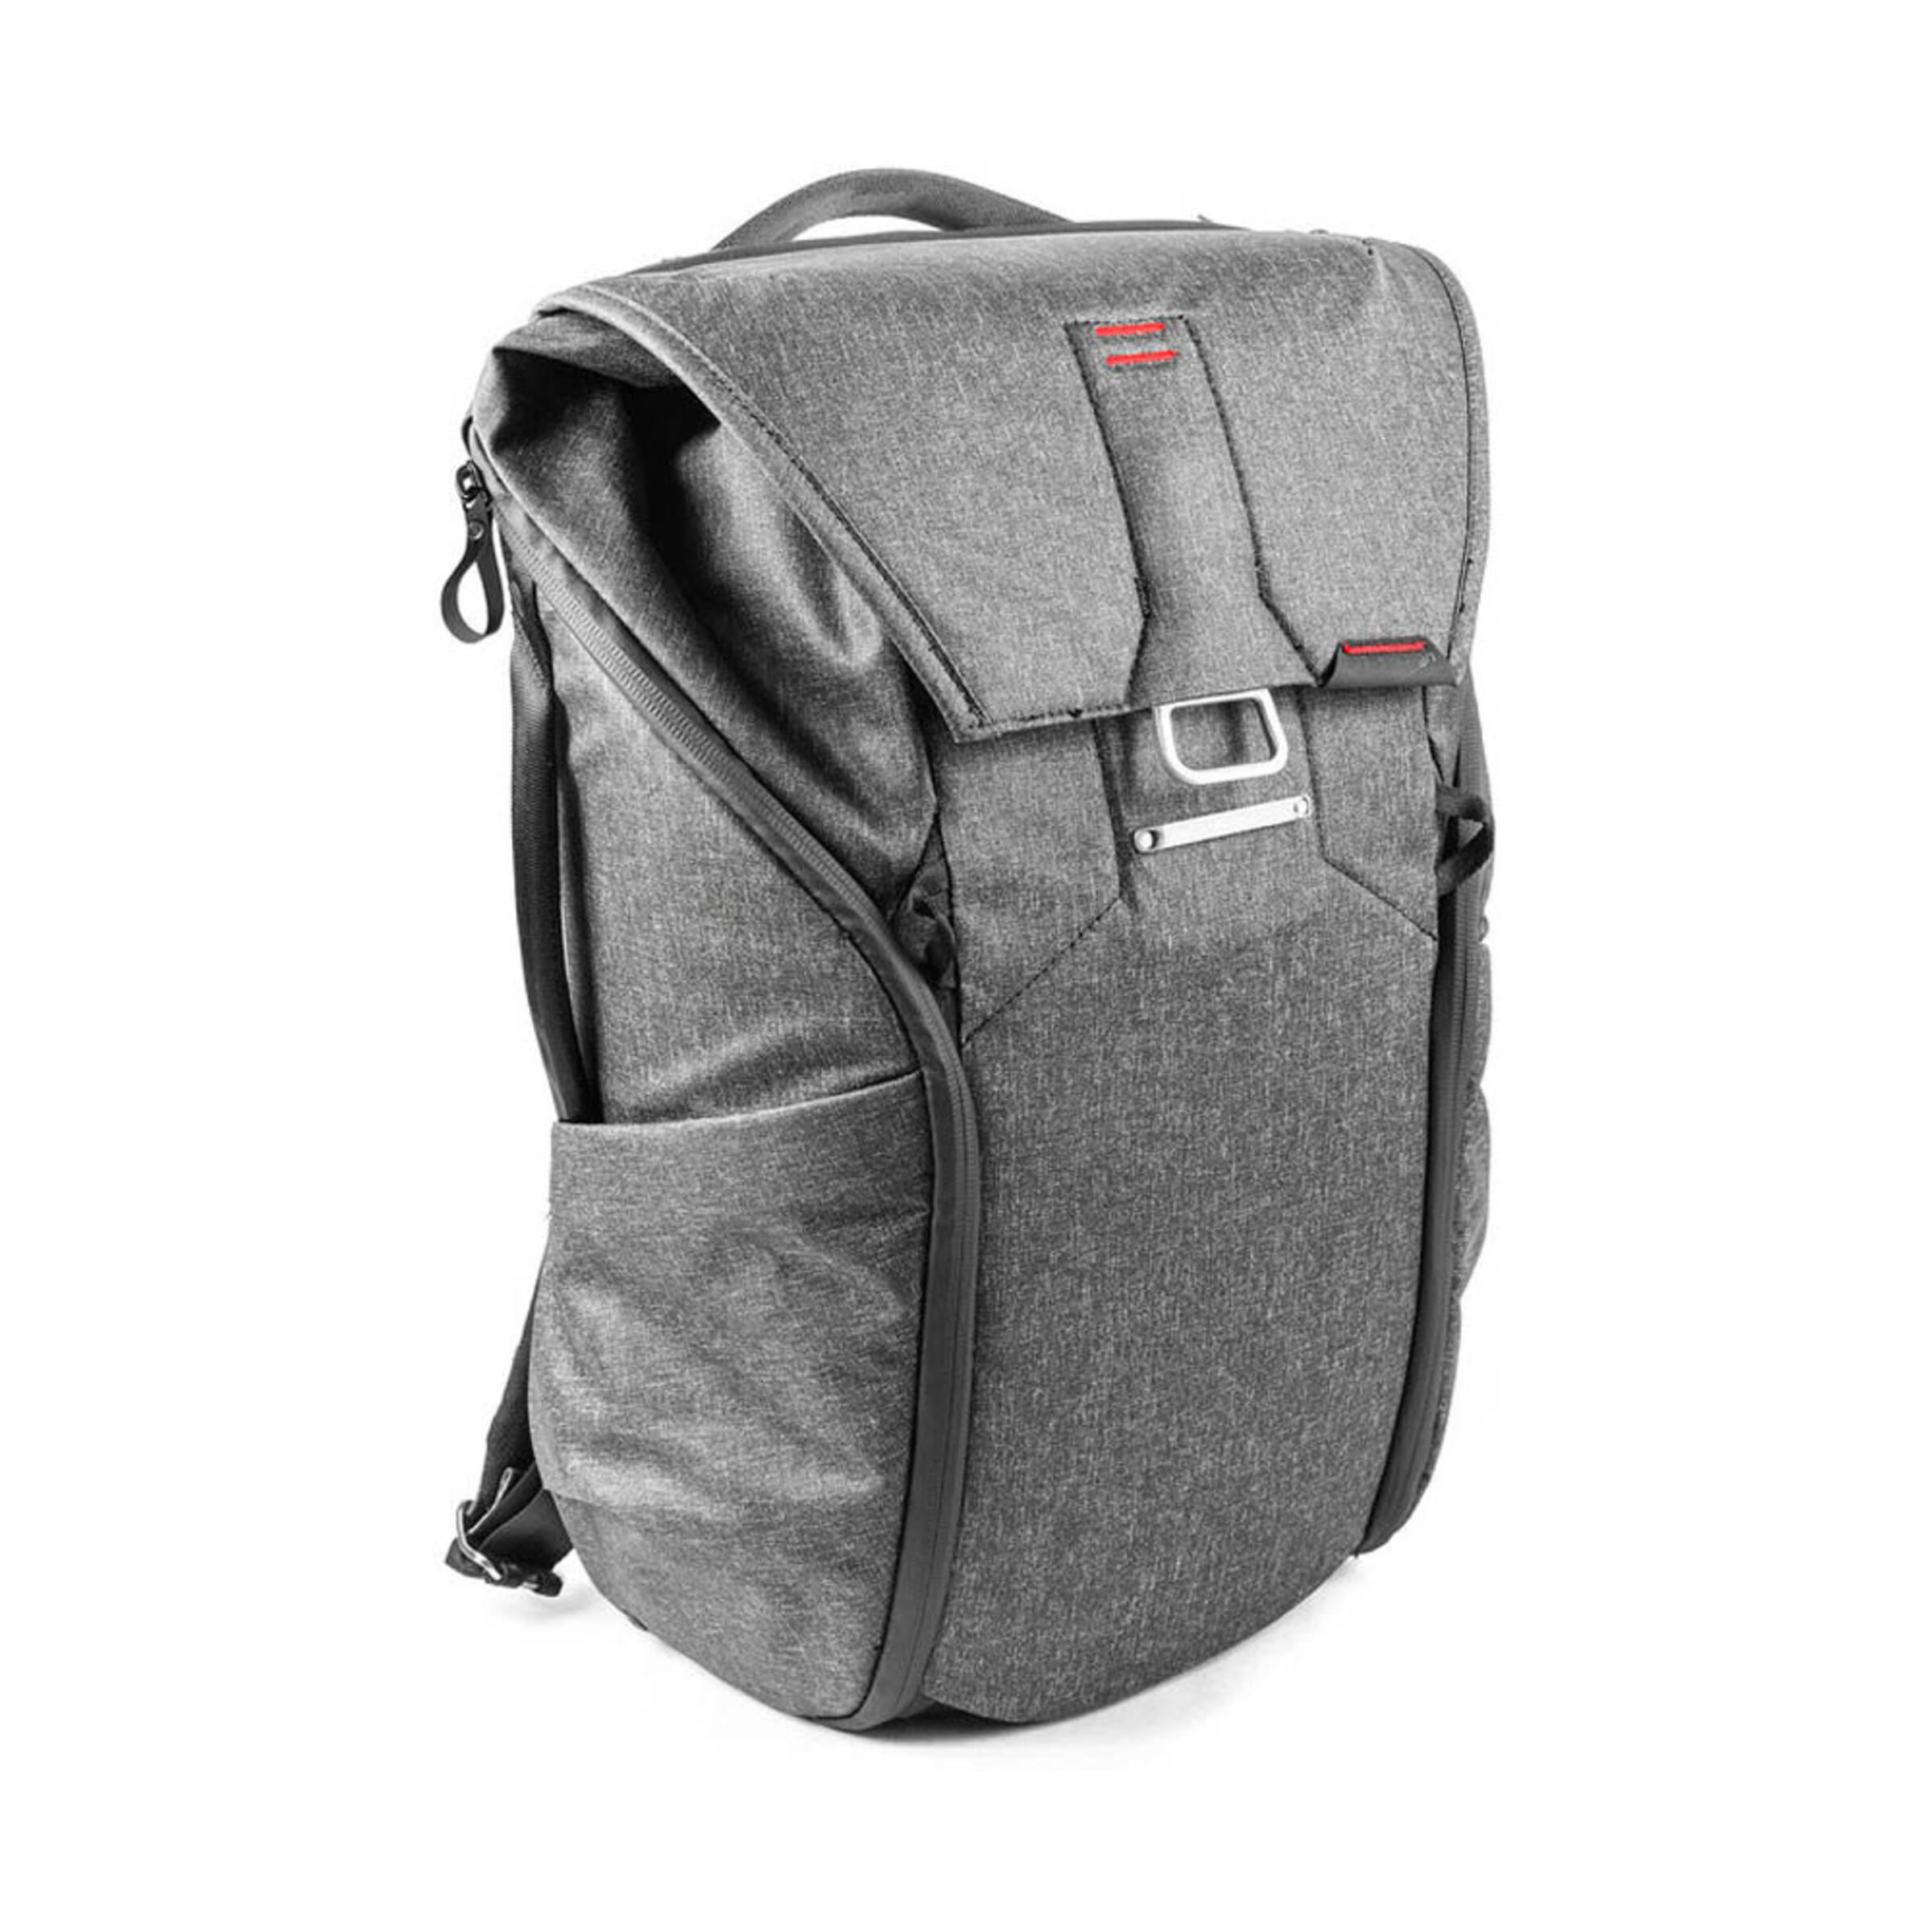 Peak Design Everyday Backpack 30L : Charcoal